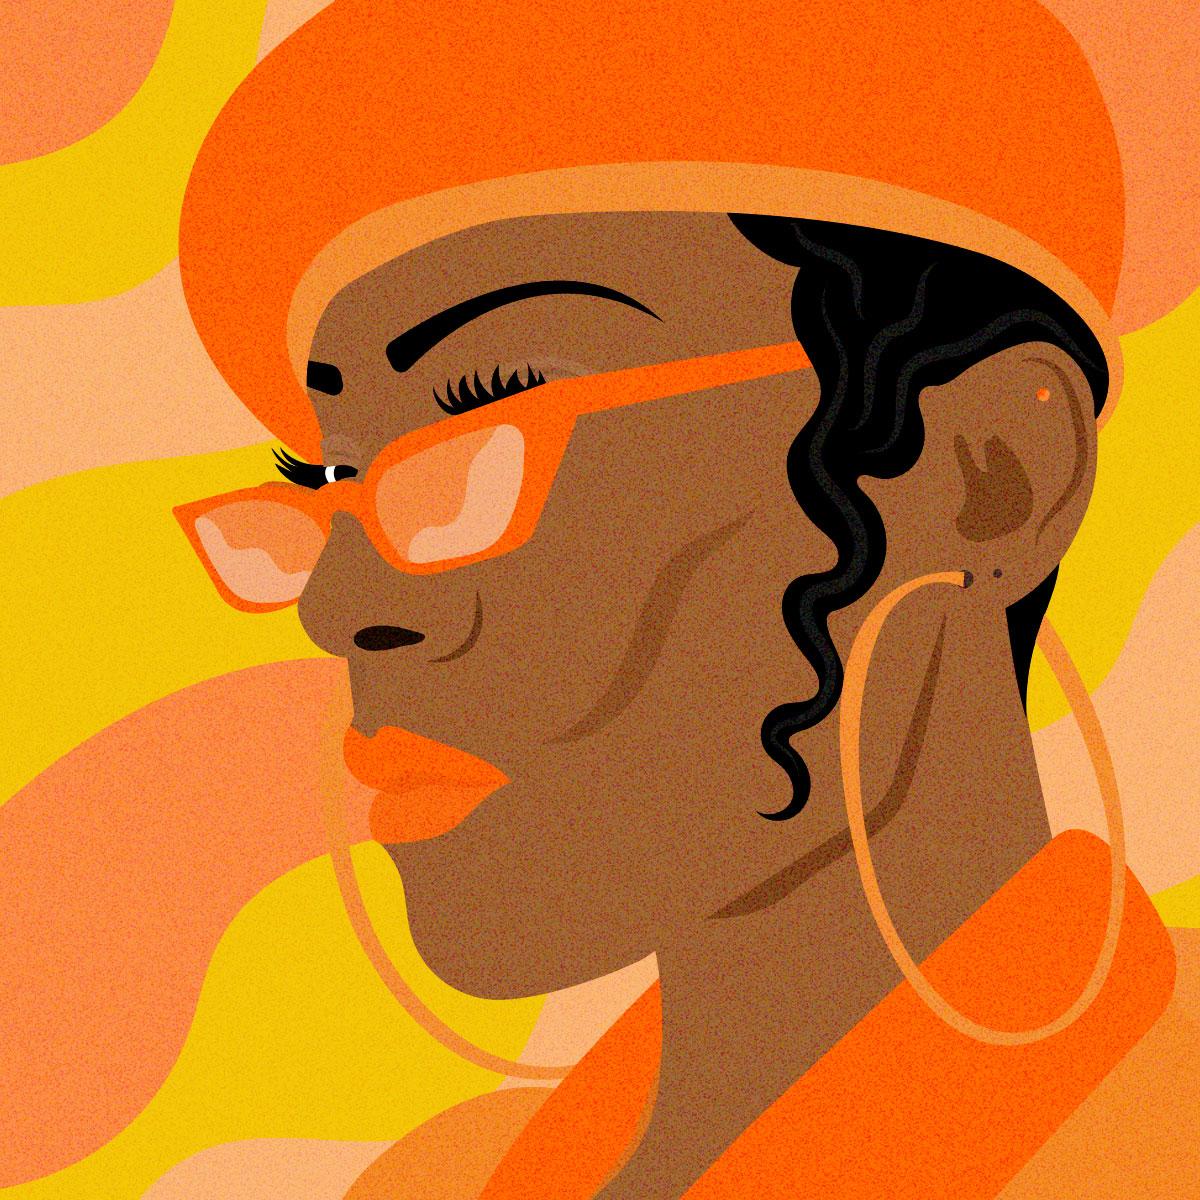 Woman_In_Hat_v2.jpg